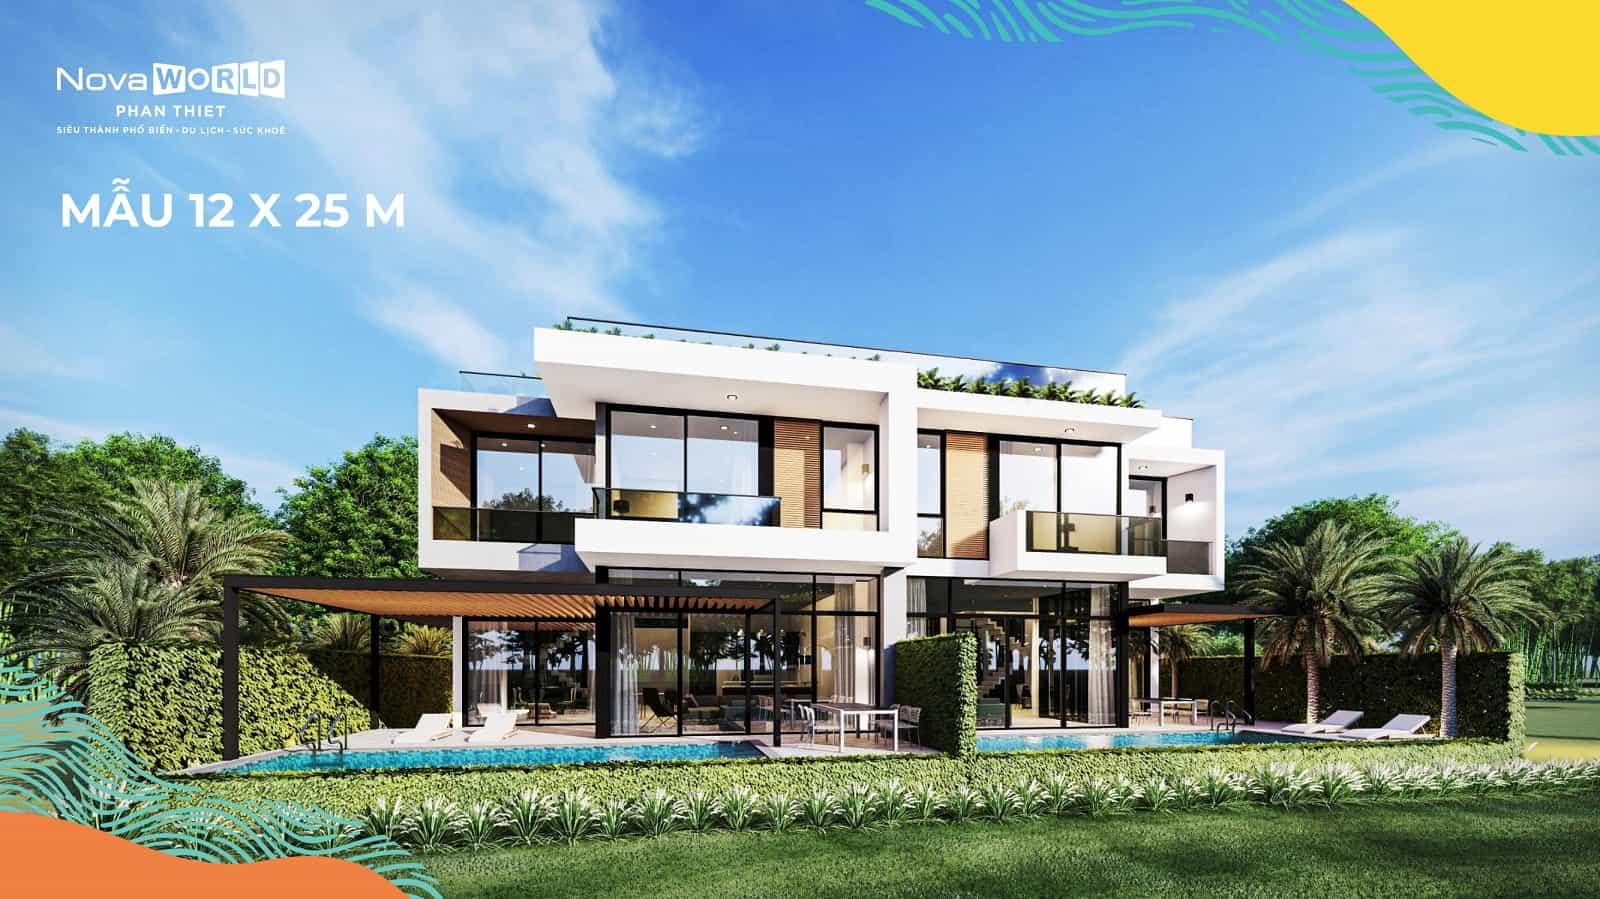 biet-thu-golf-villas-12x25-novaworld-phan-thiet